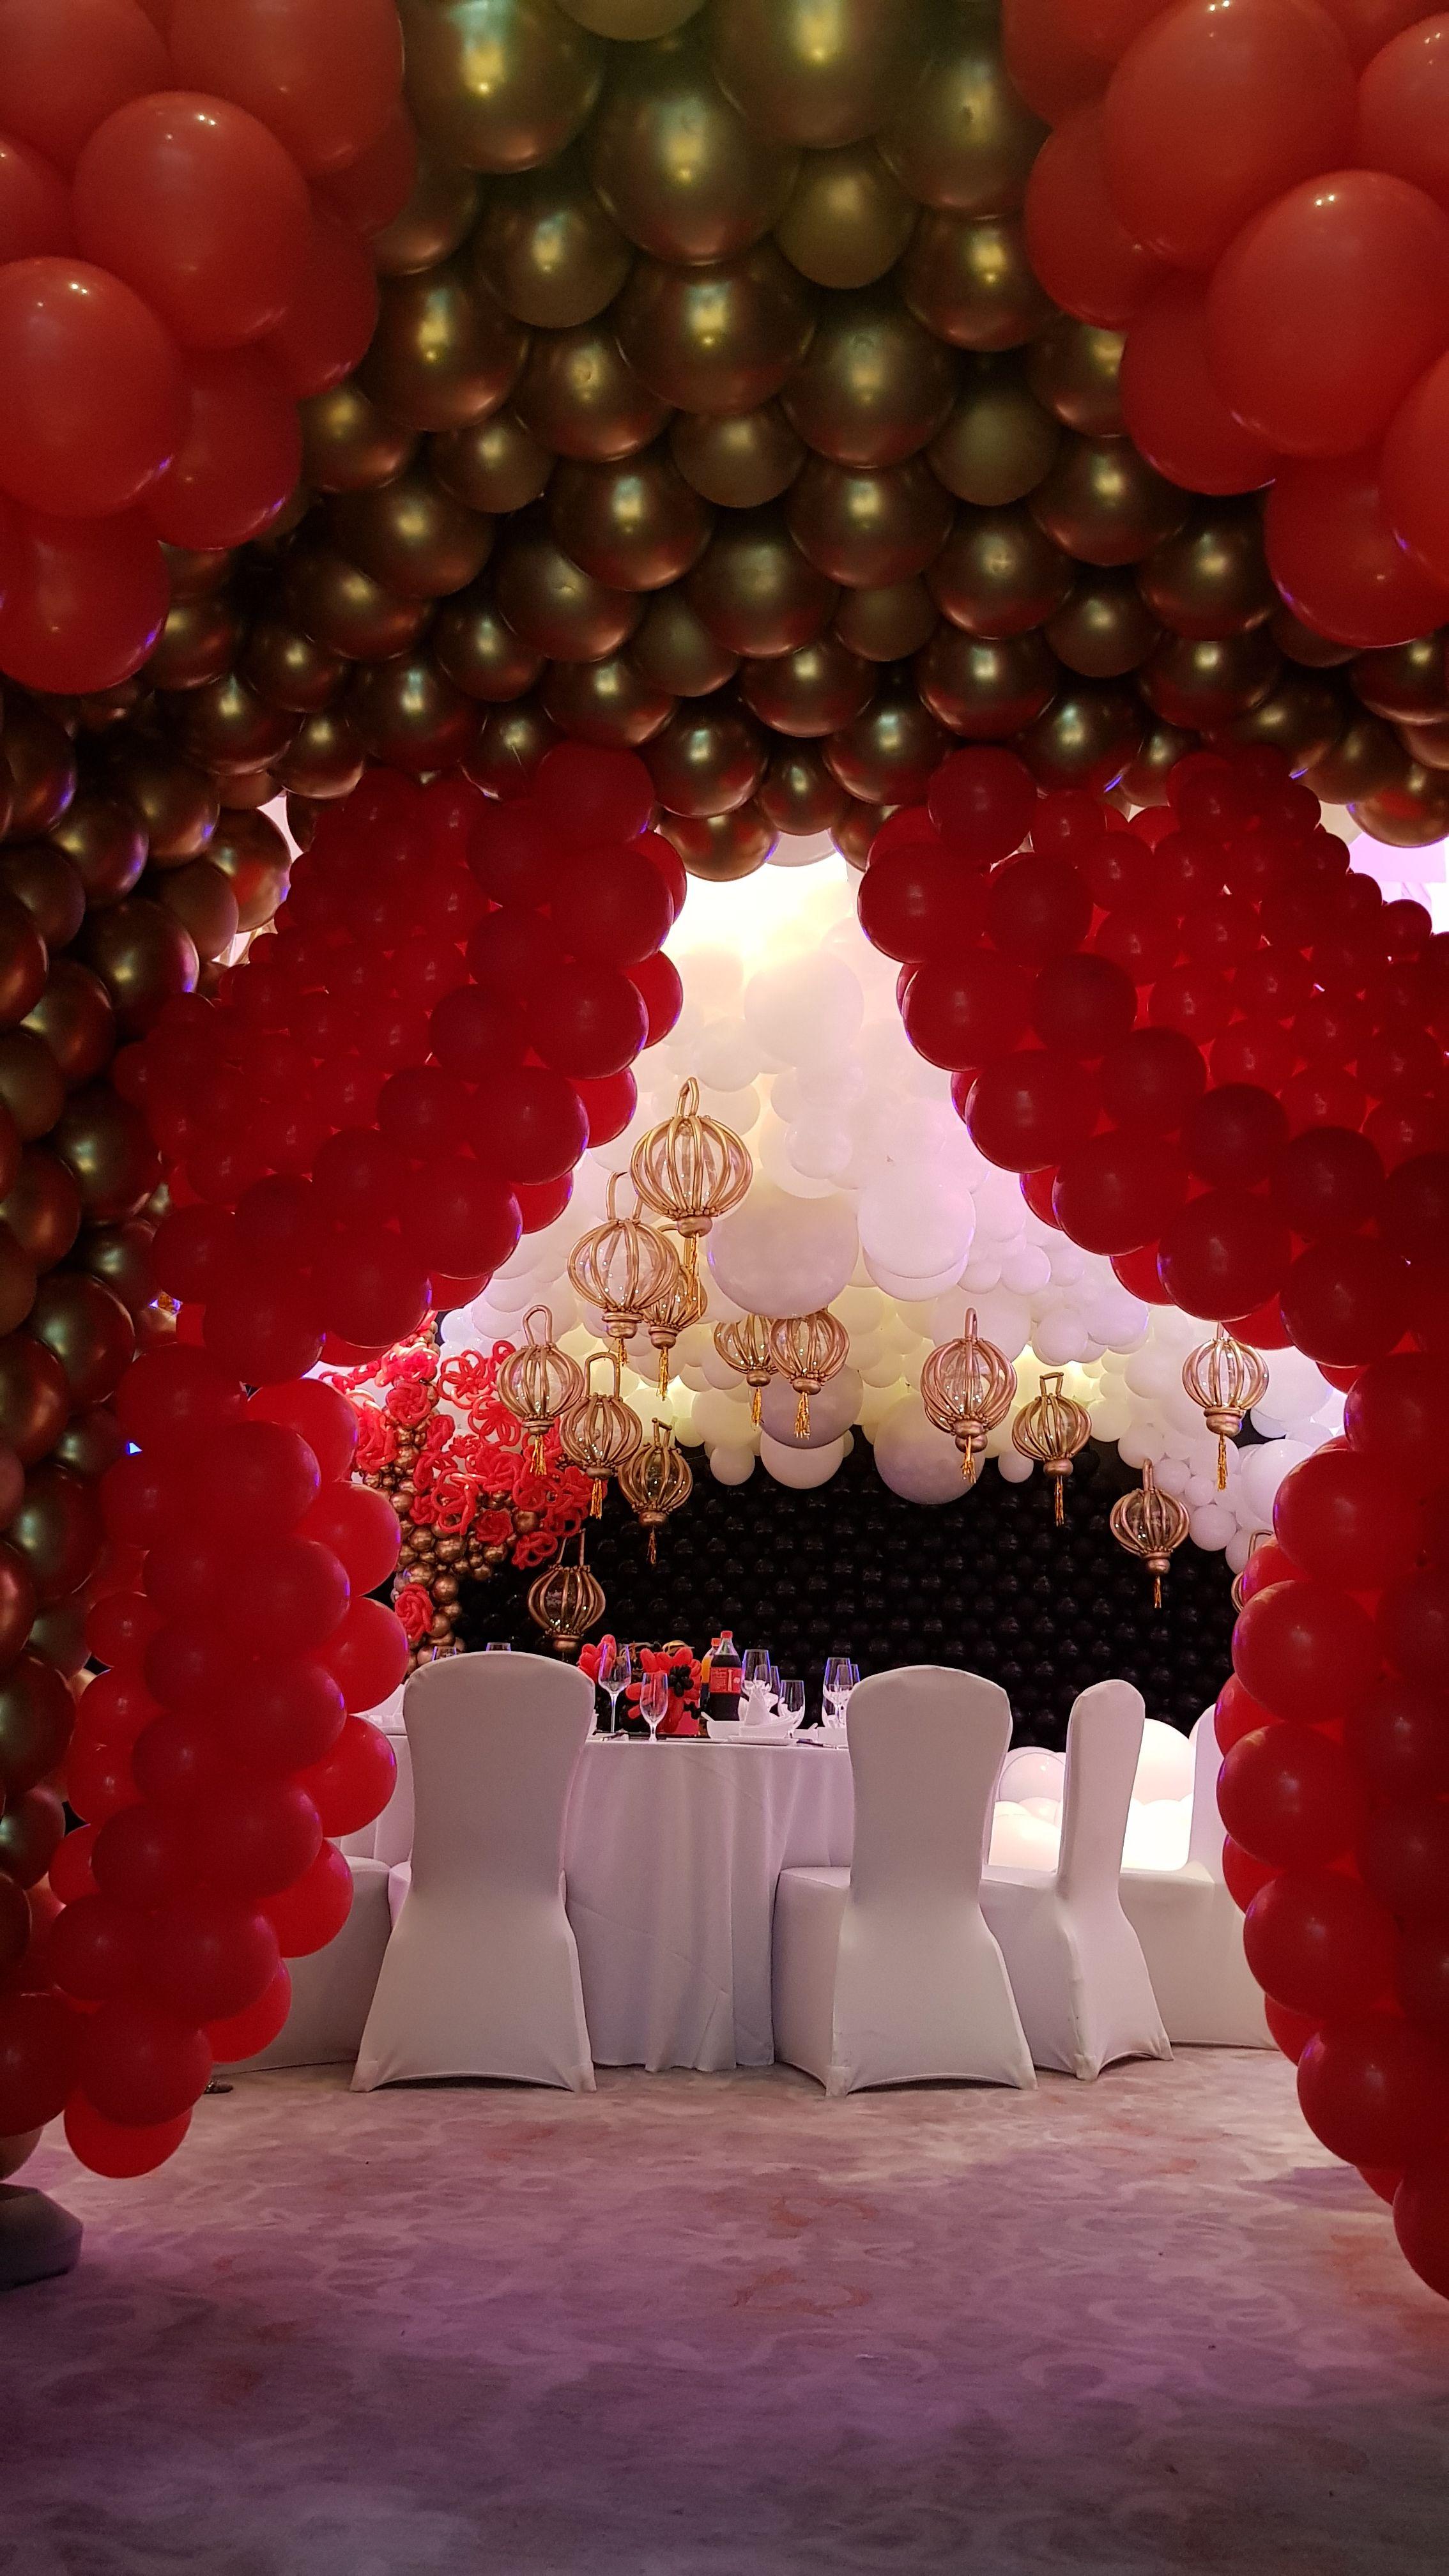 Shape Cut Art Projects Craft Decoration Gift Decoupage Ornament MG000116 Big Wooden Air Balloon 15cm